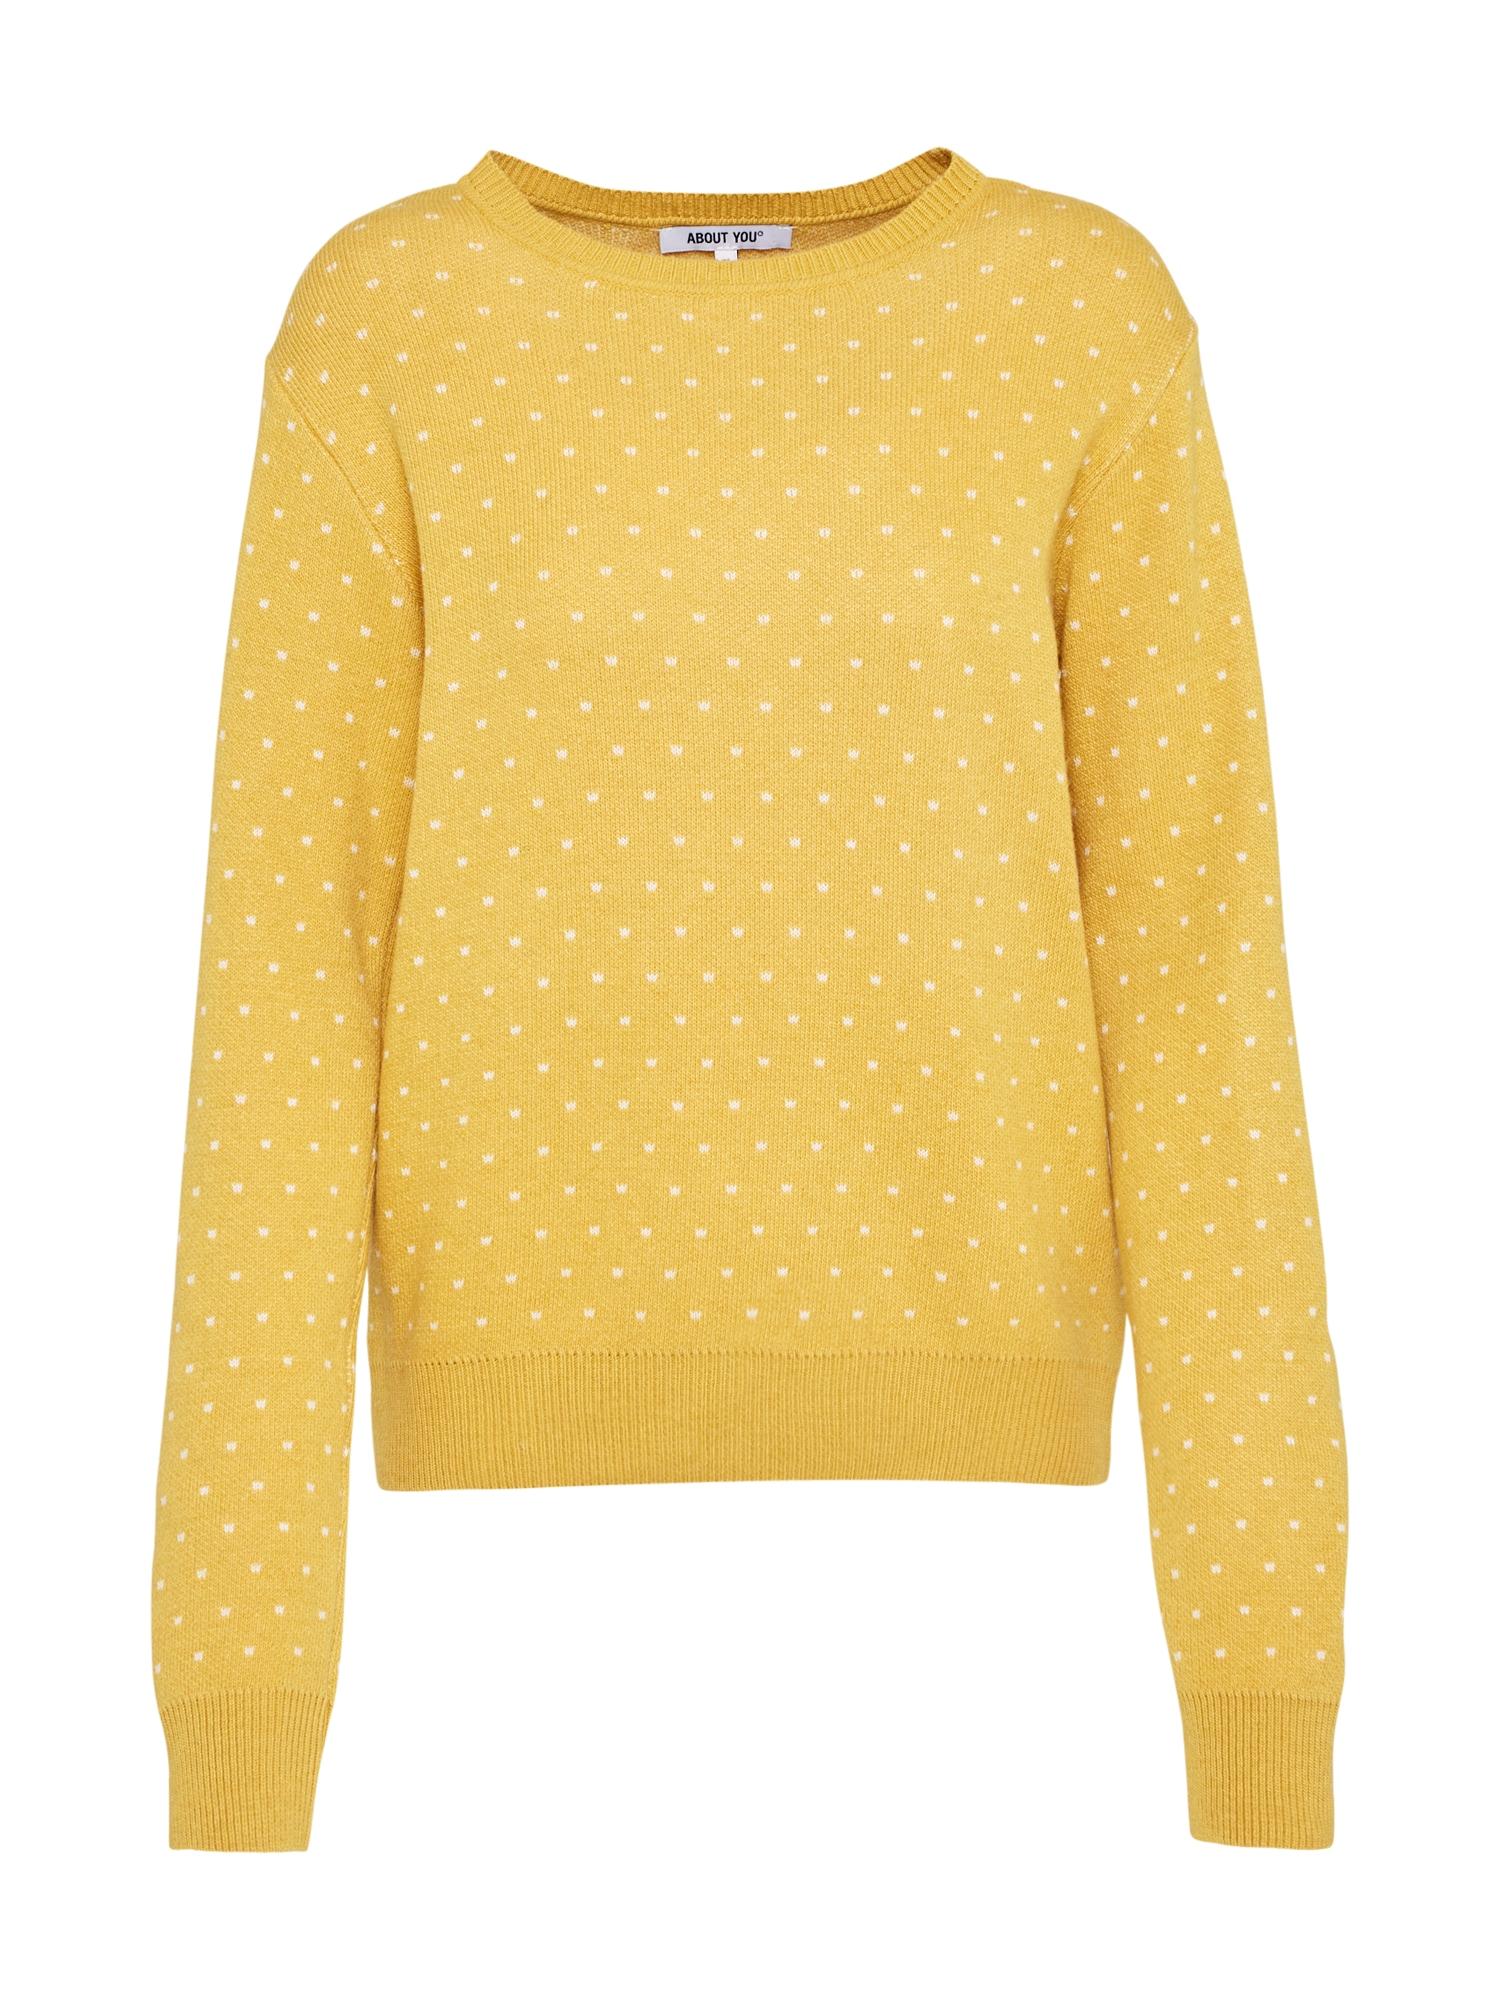 ABOUT YOU Megztinis 'Leena Jumper' geltona / kario spalva